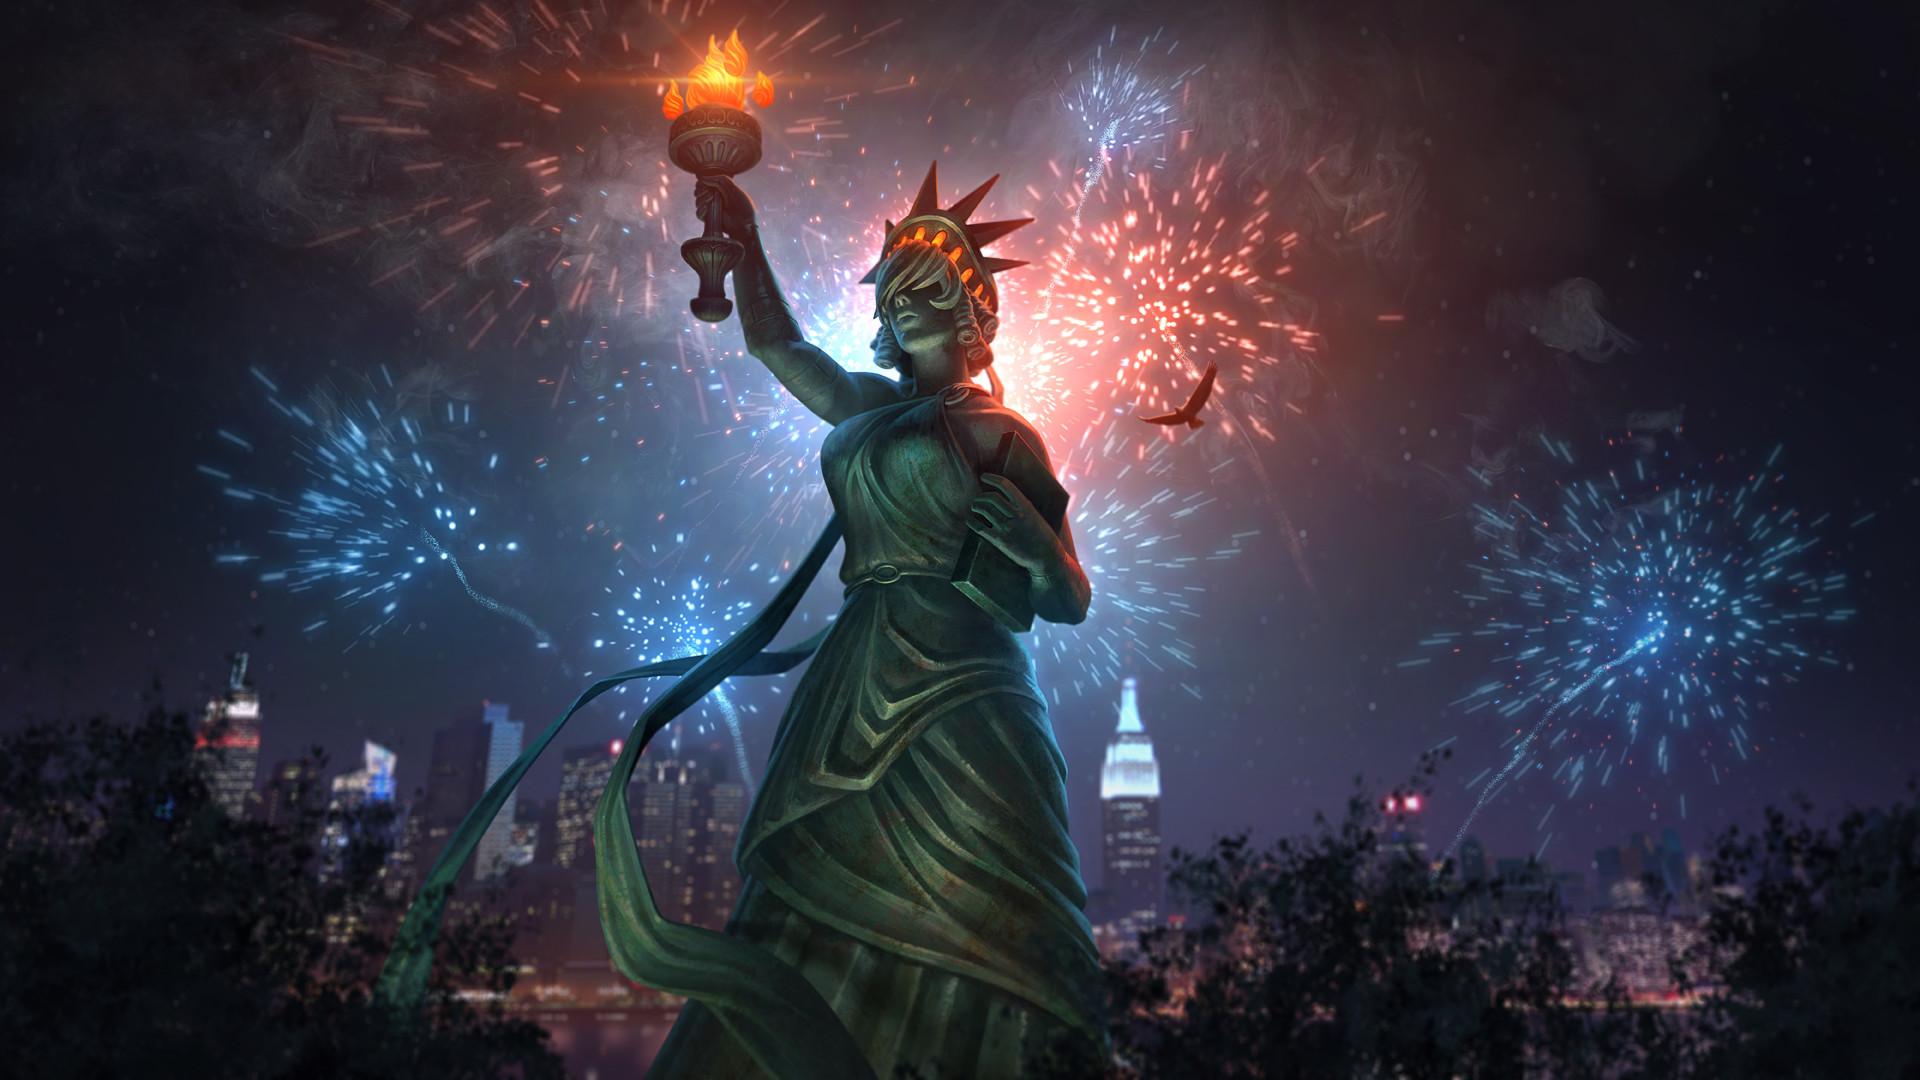 Res: 1920x1080, Lady Liberty Nox Wallpapers